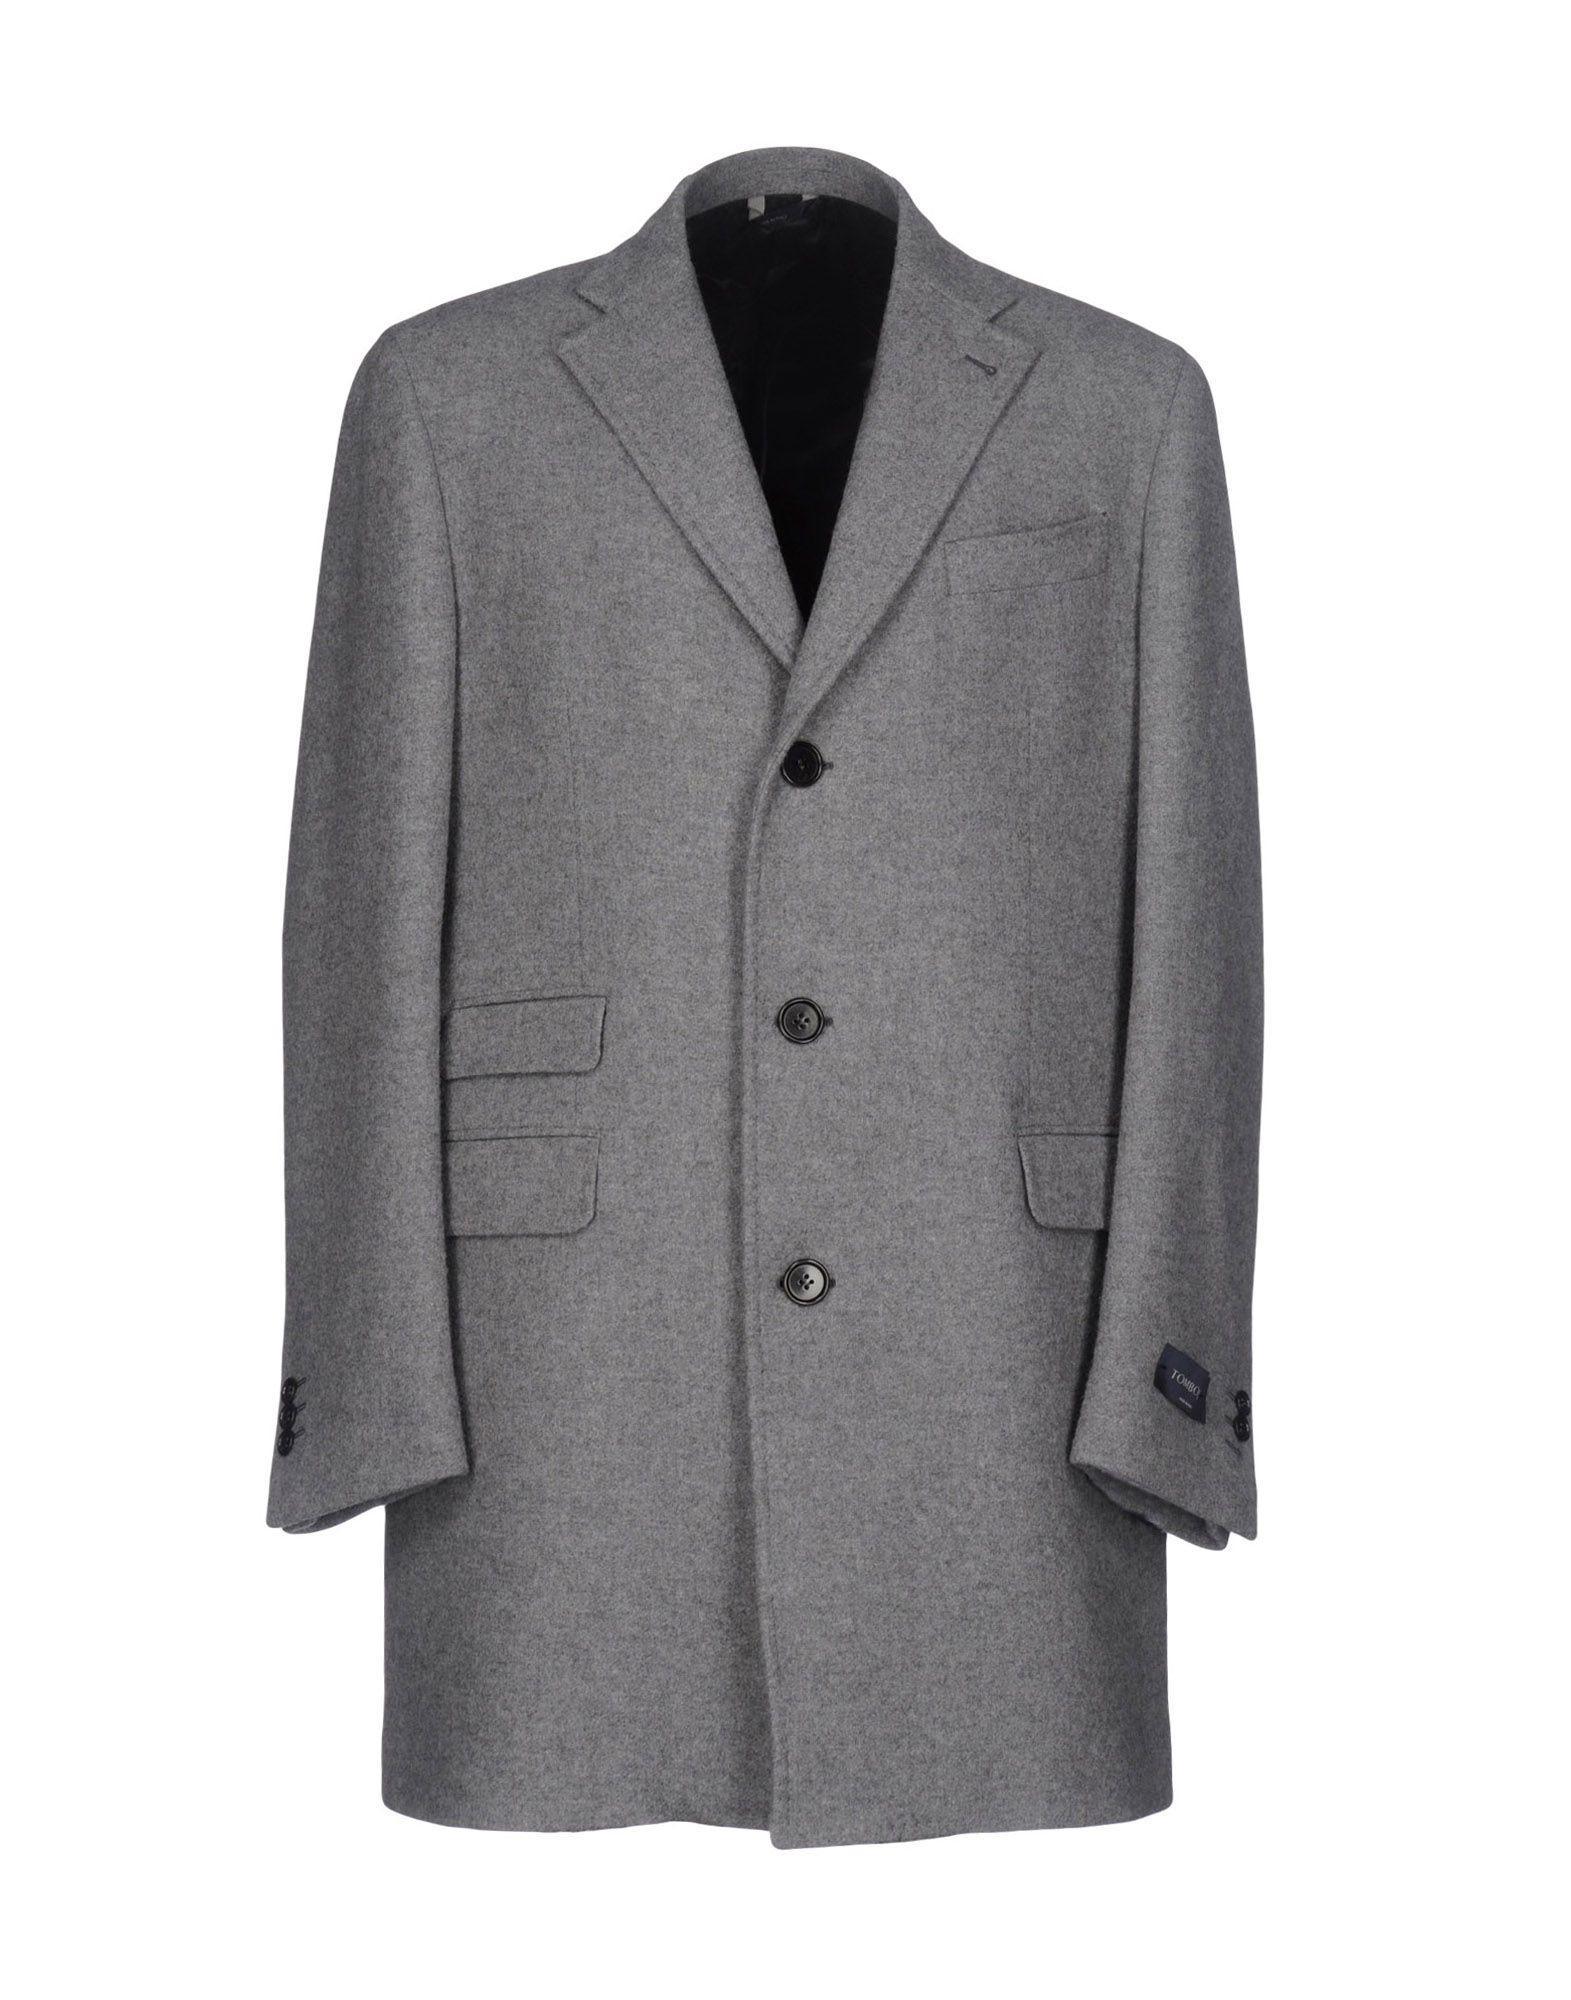 Tombolini Coats In Grey